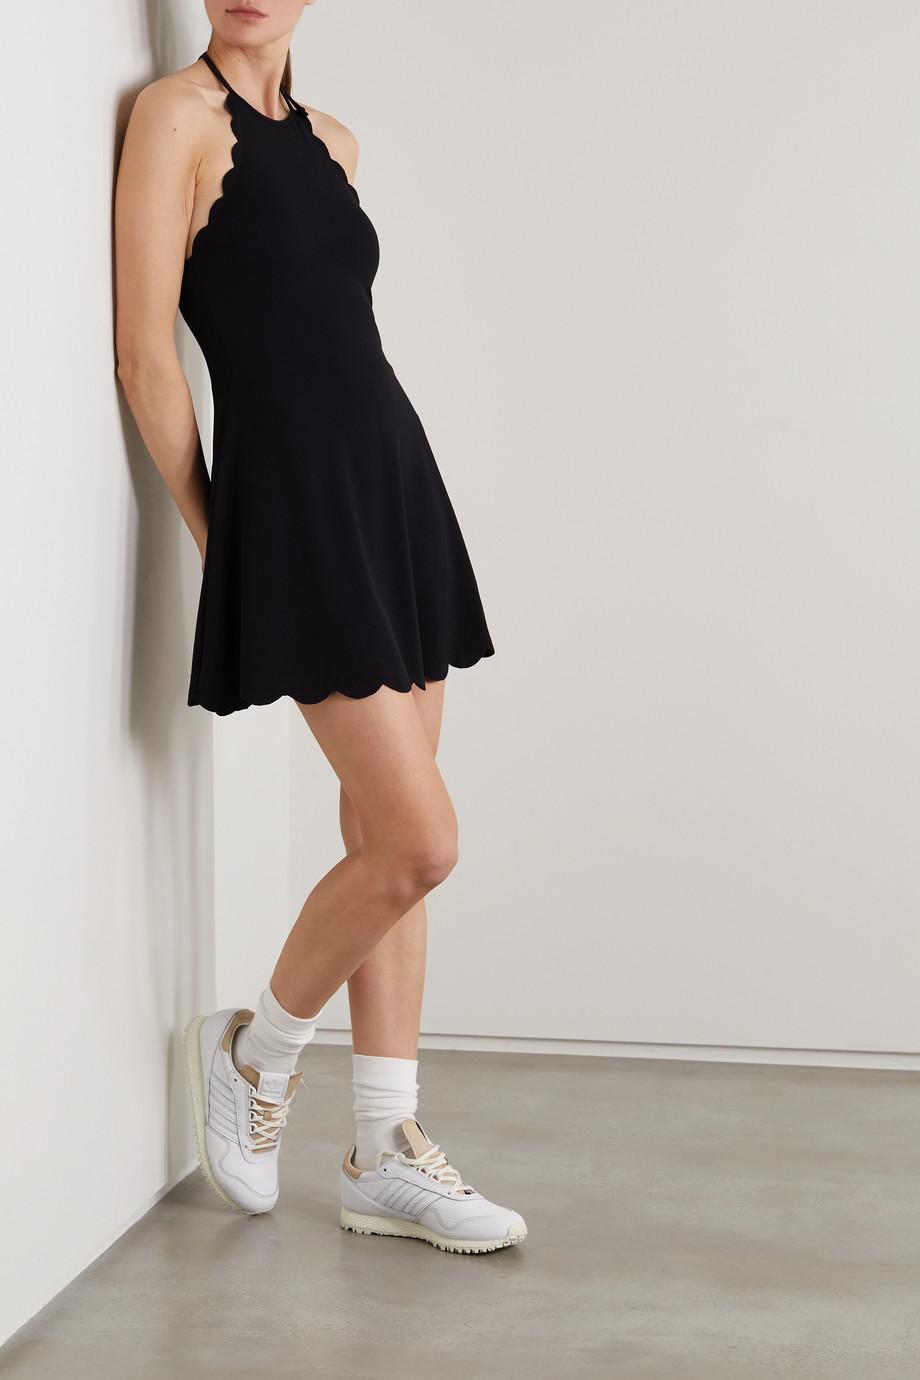 Marysia + NET SUSTAIN Bianca scalloped stretch recycled-seersucker halterneck tennis dress